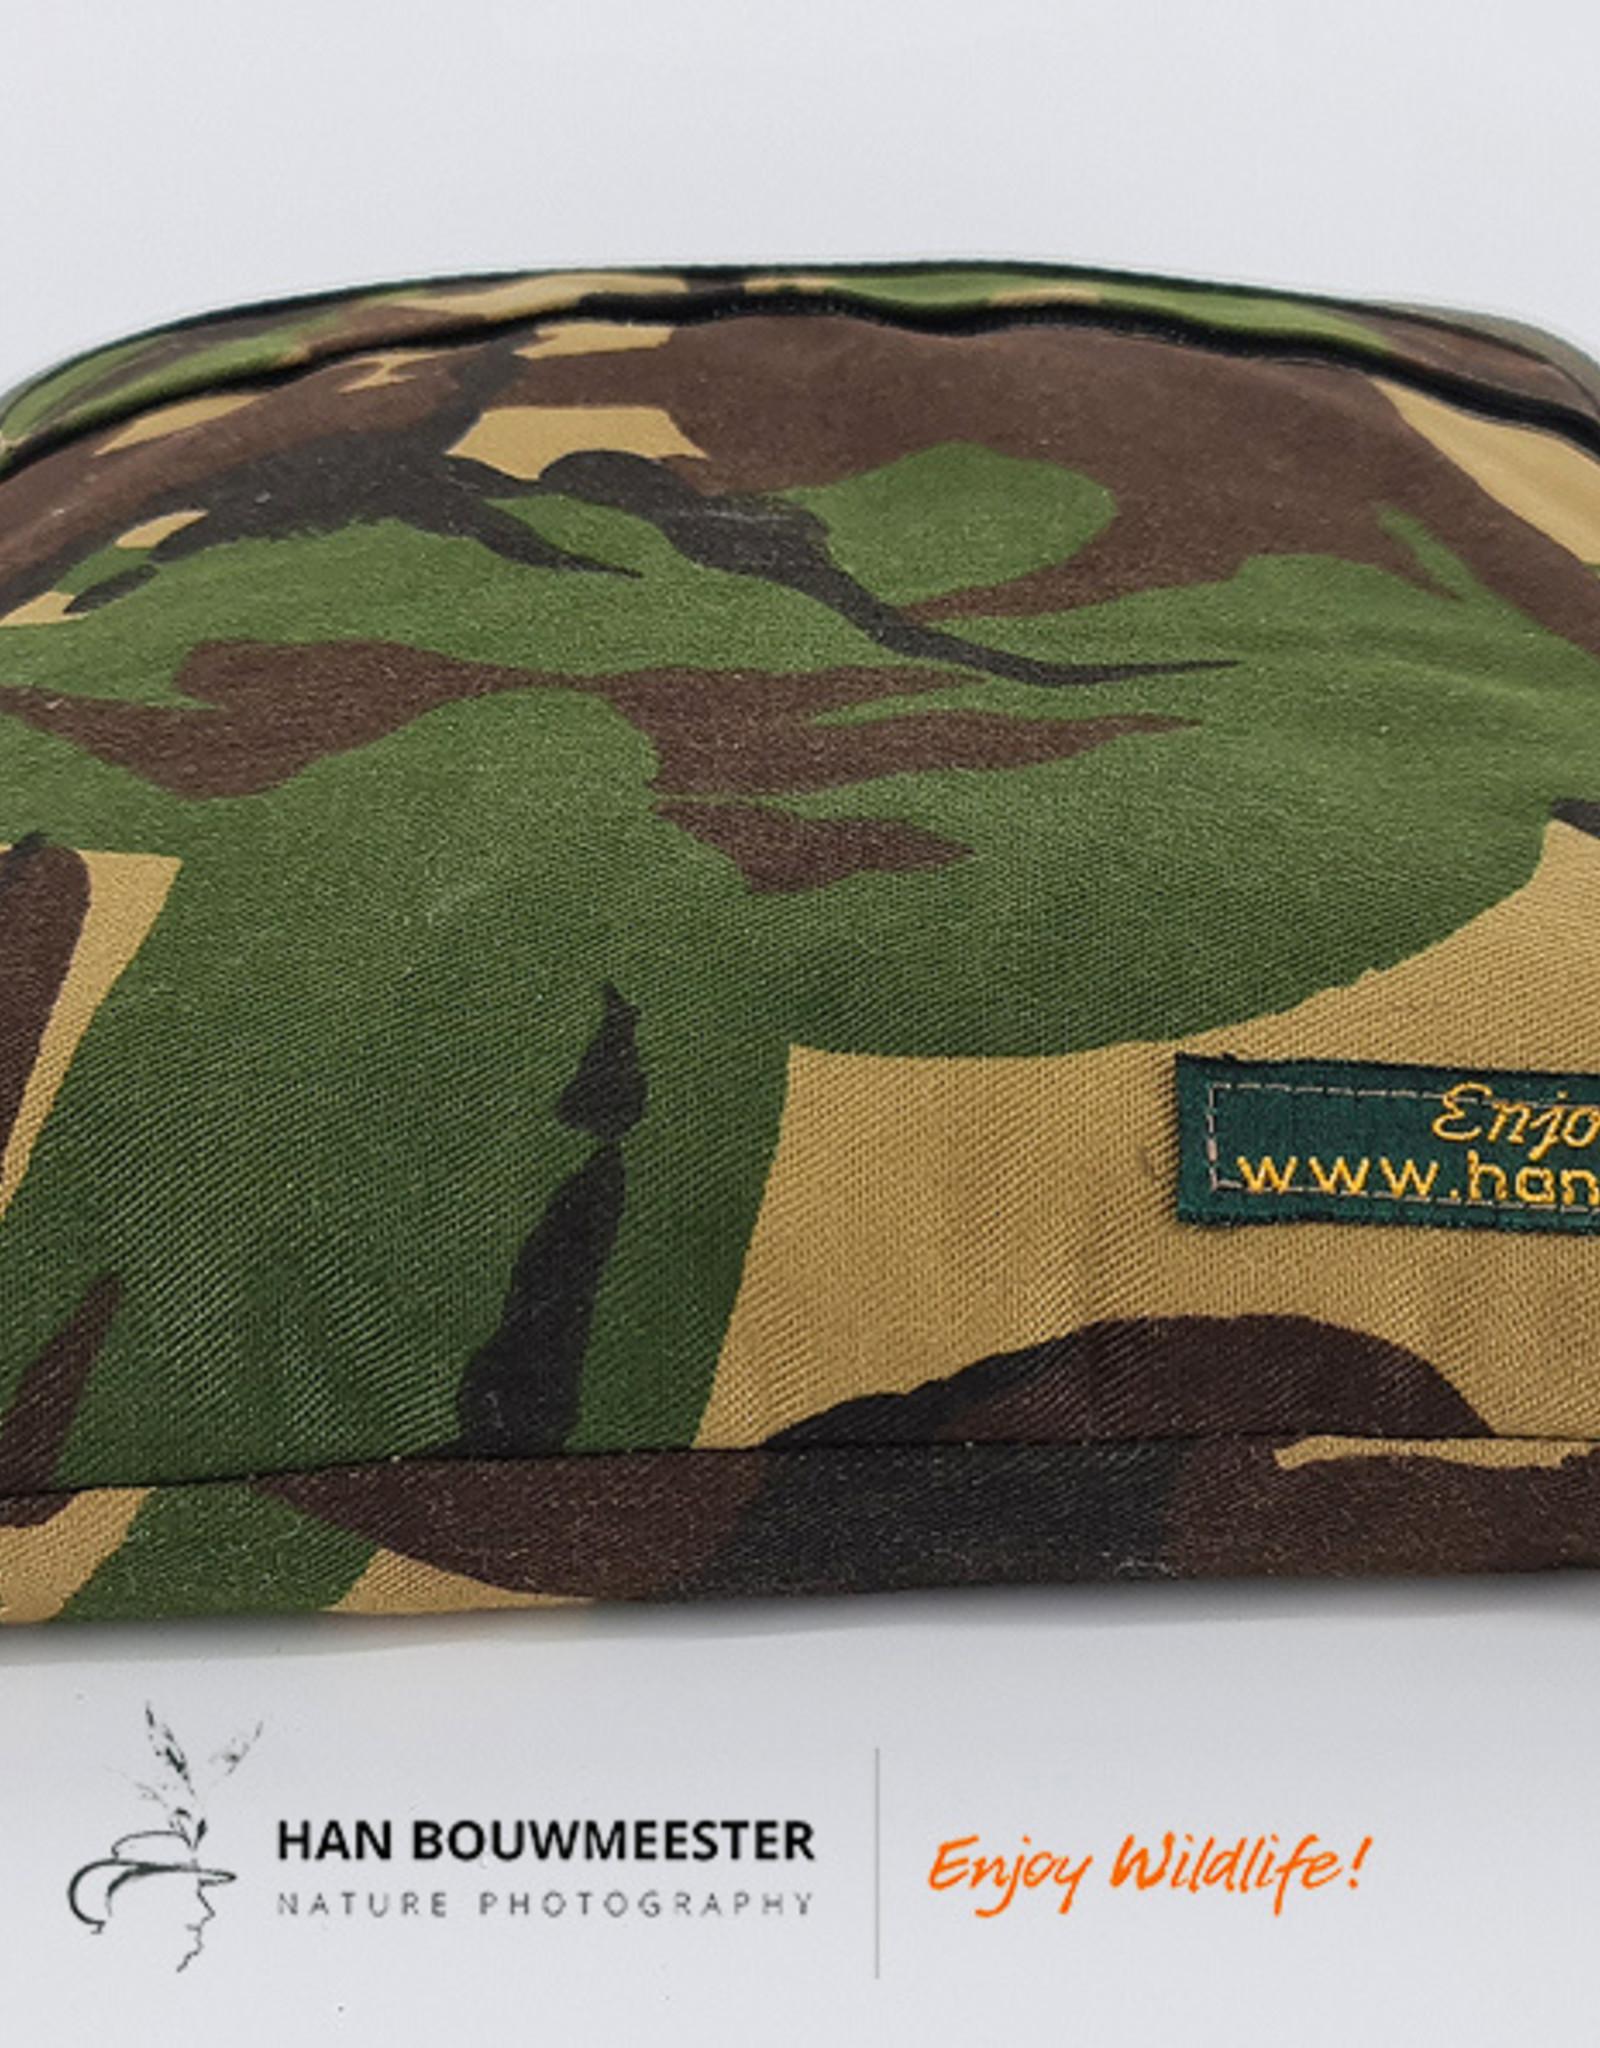 HBN - Enjoy Wildlife! HBN basic beanbag